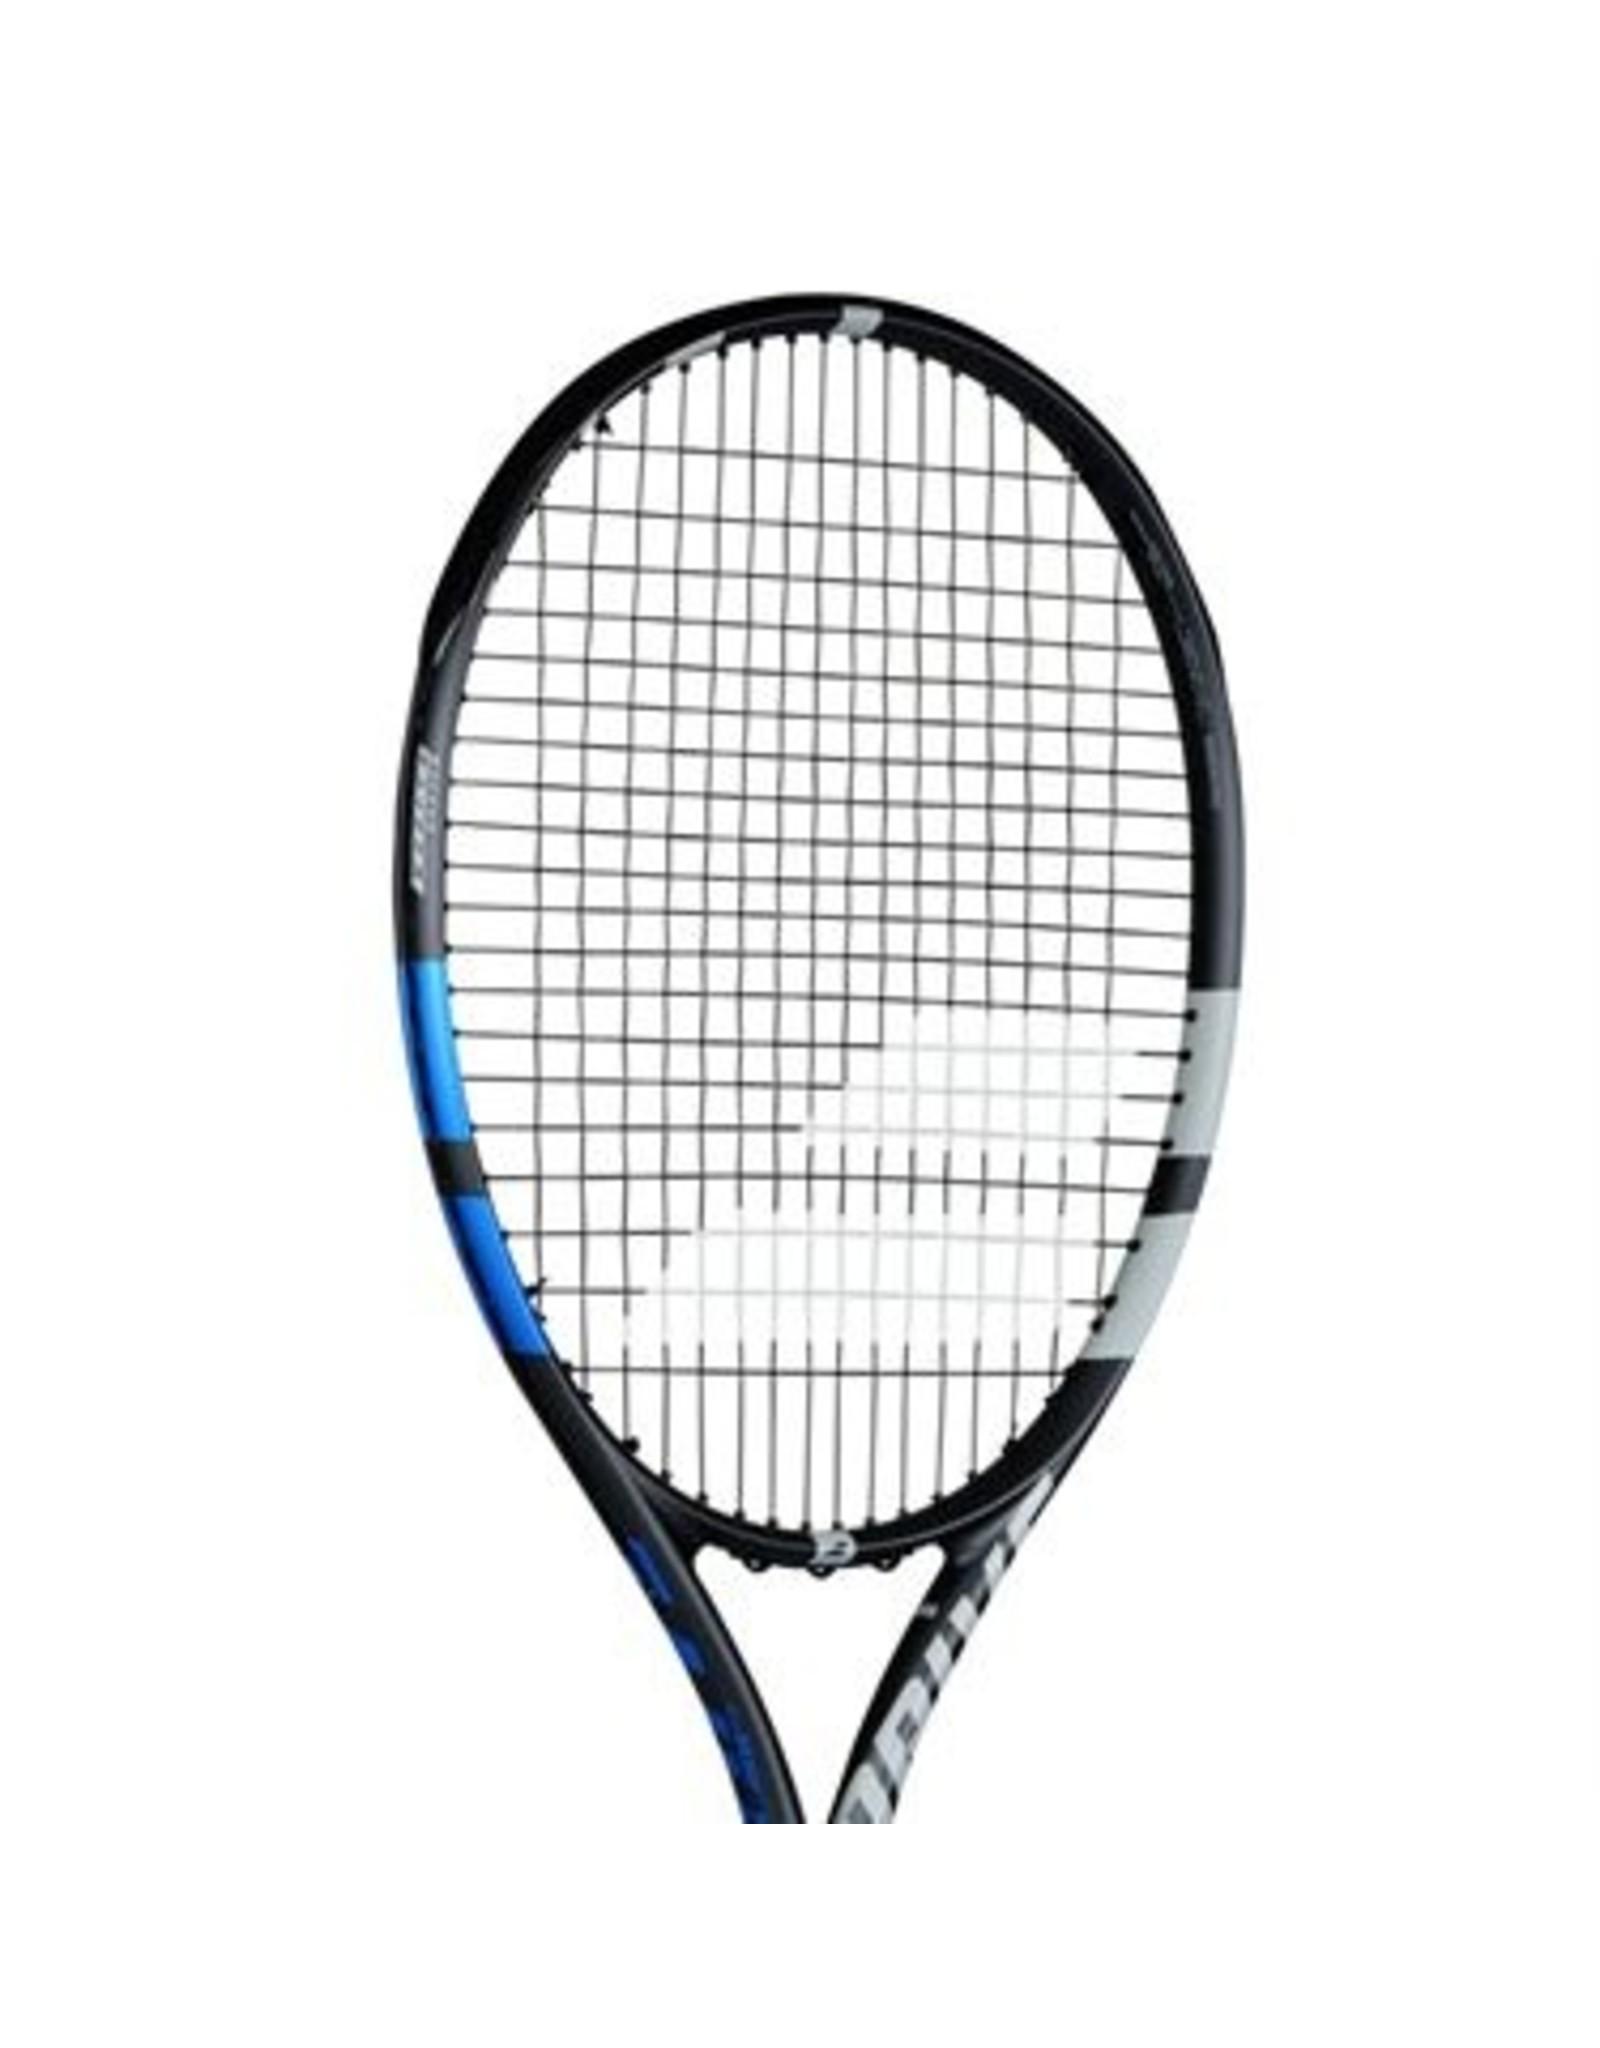 Babolat Babolat Drive G 115 Tennis Racquet